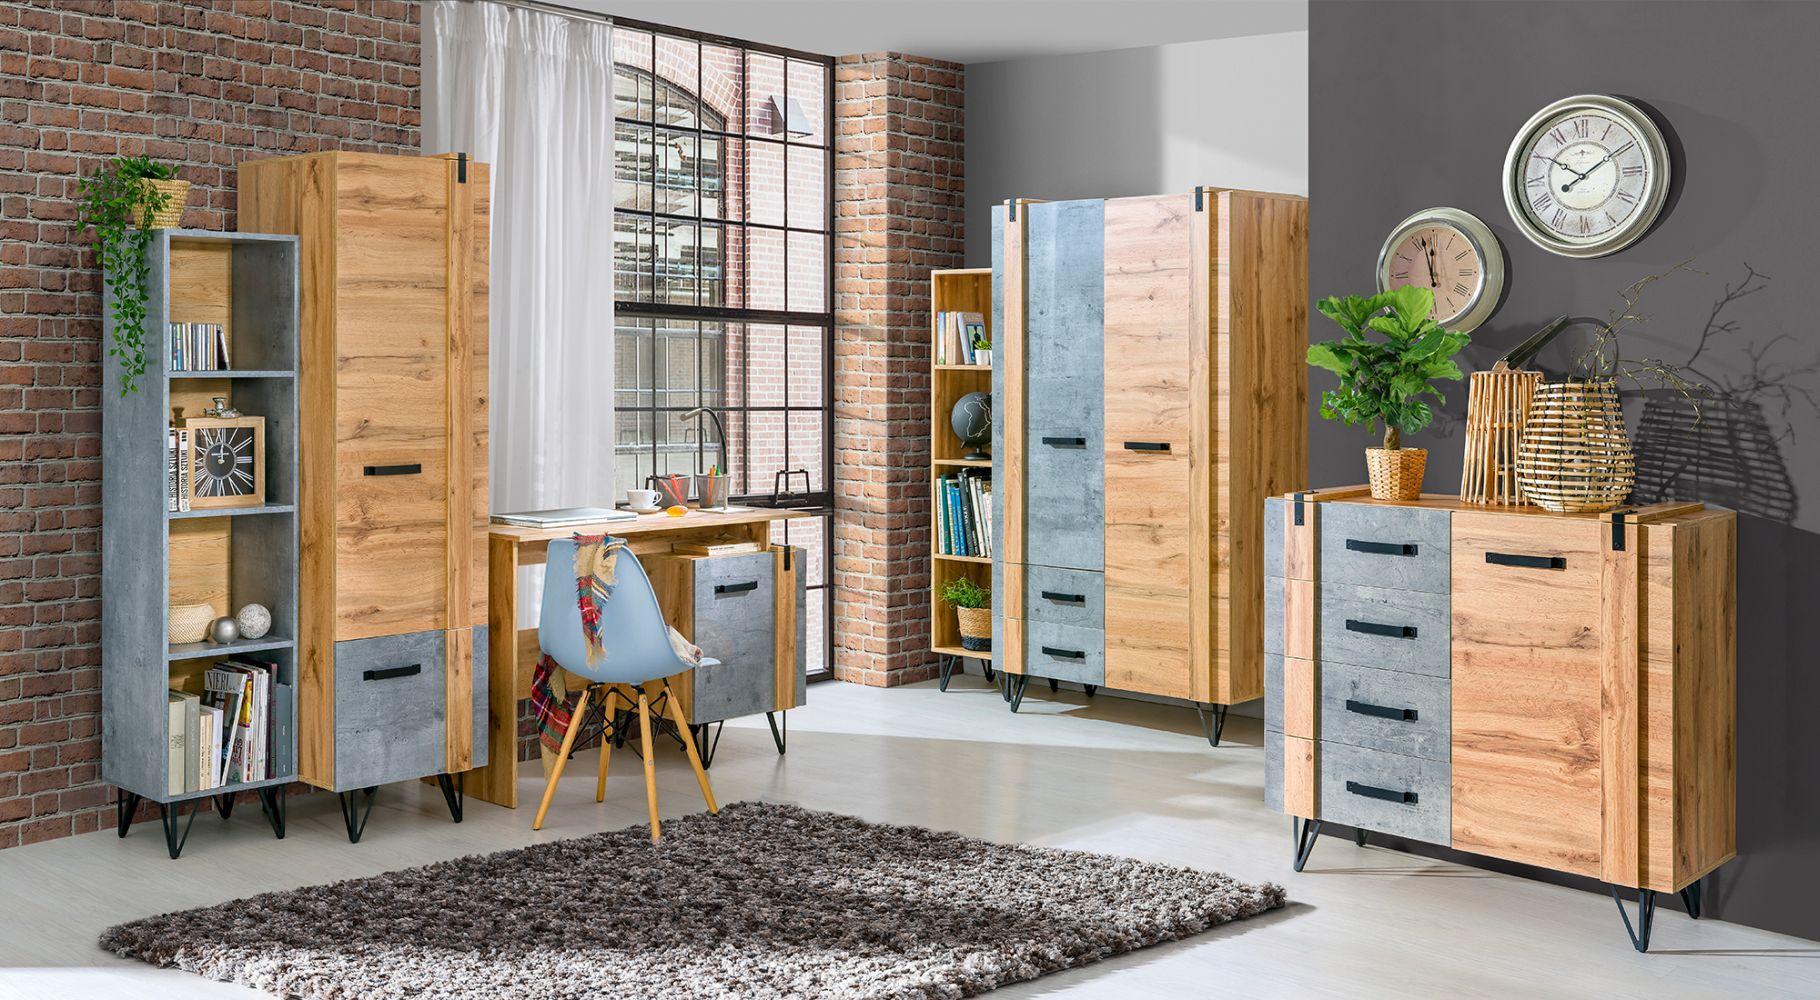 Wohnzimmer Komplett - Set G Atule, 6-teilig, Farbe: Eiche / Grau